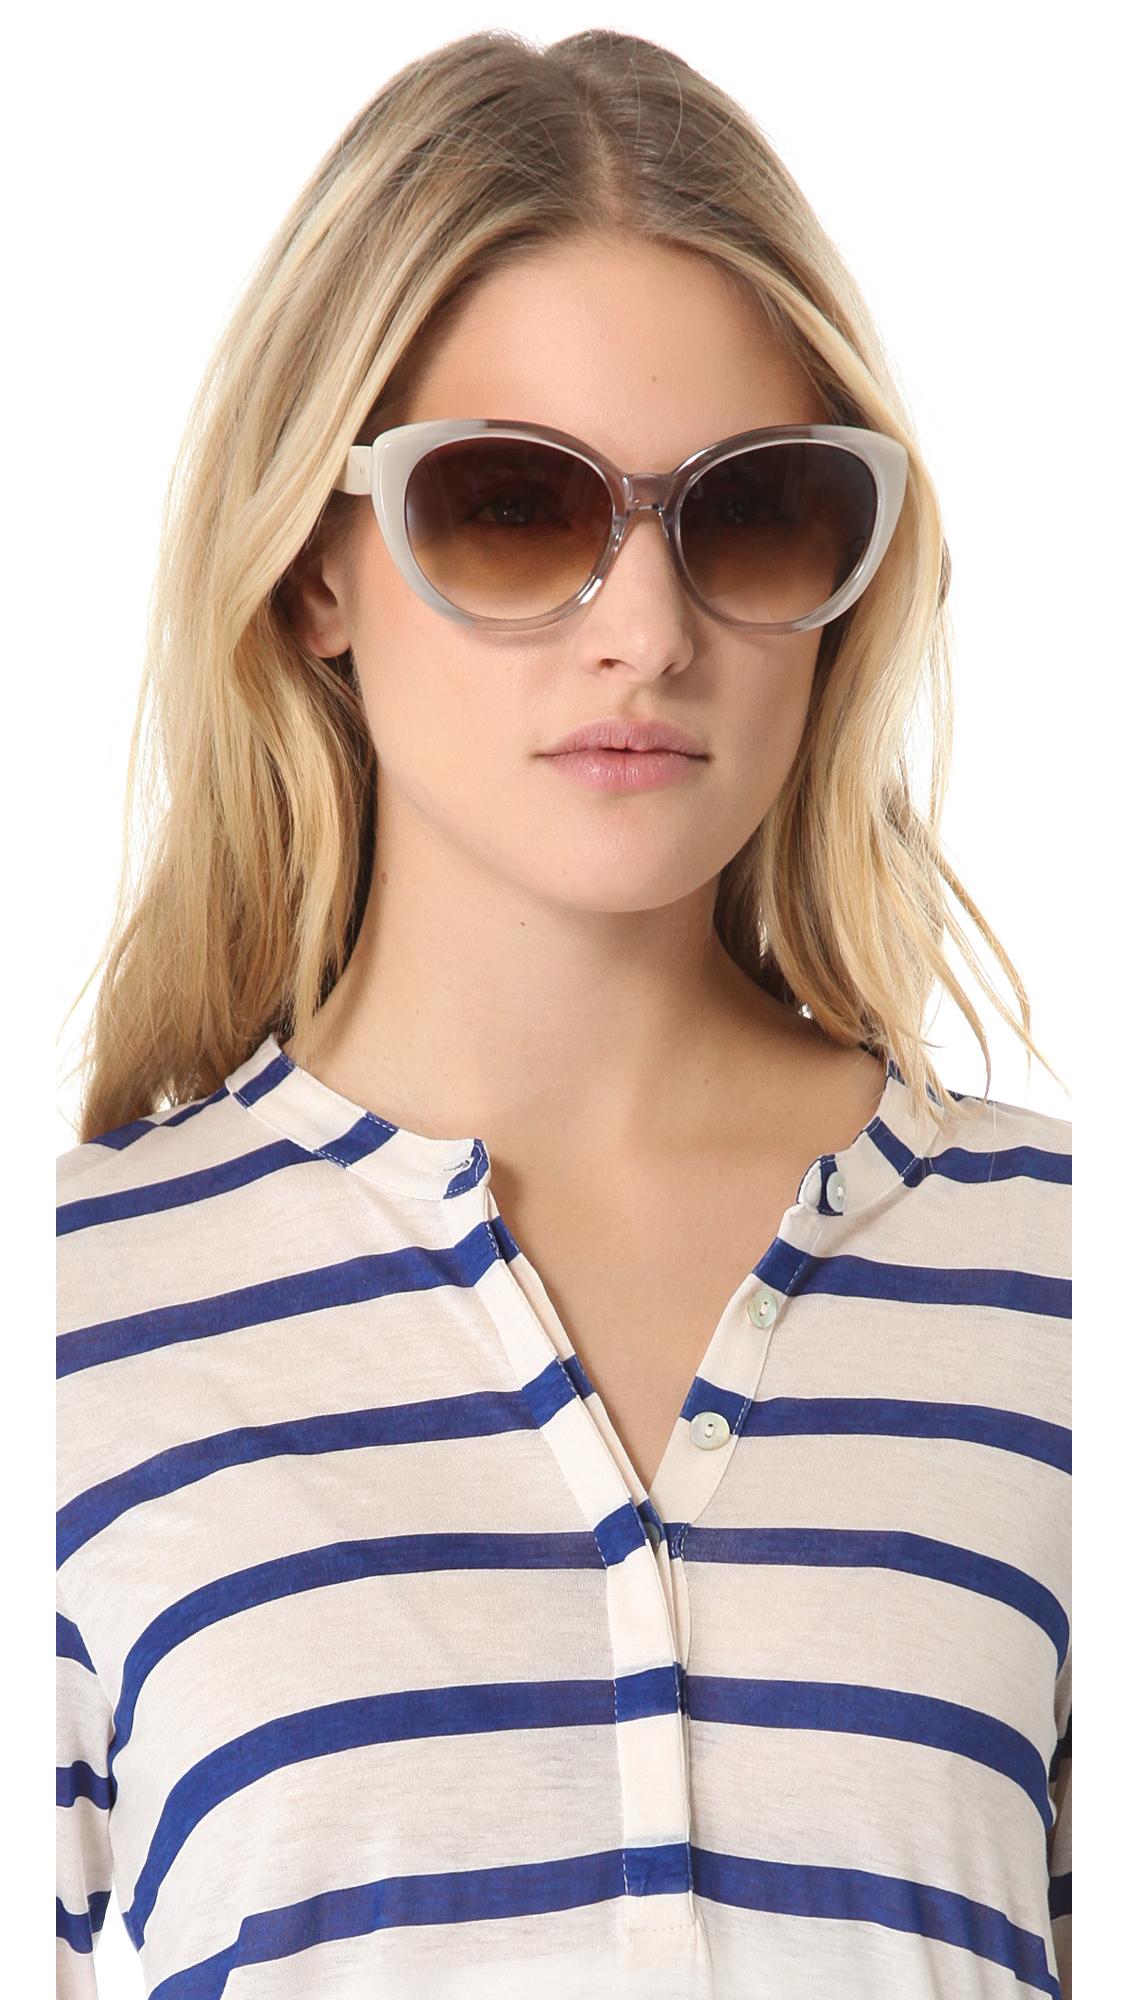 b6bfa19bc1d Lyst - Dita Amant Sunglasses in Brown